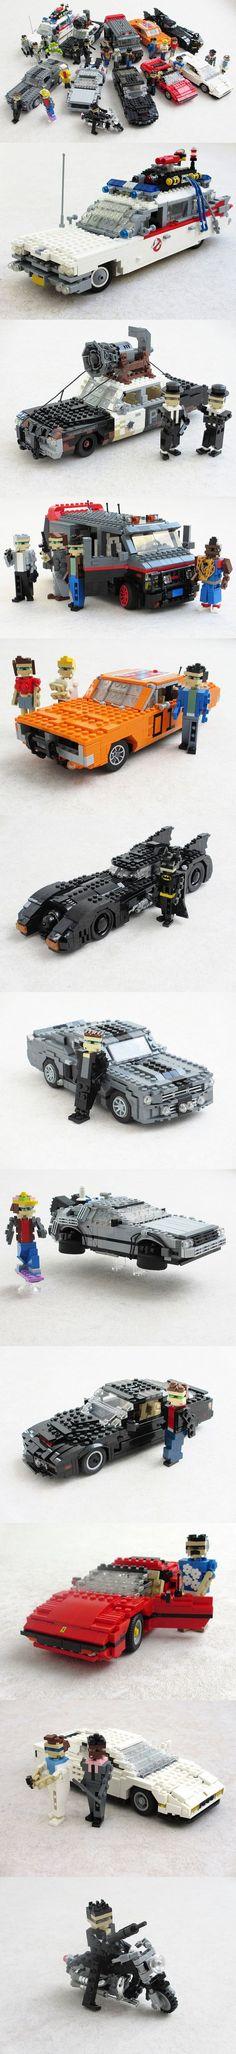 A-mahh-zing LEGOland scale pop culture vehicles and drivers. Excellent!